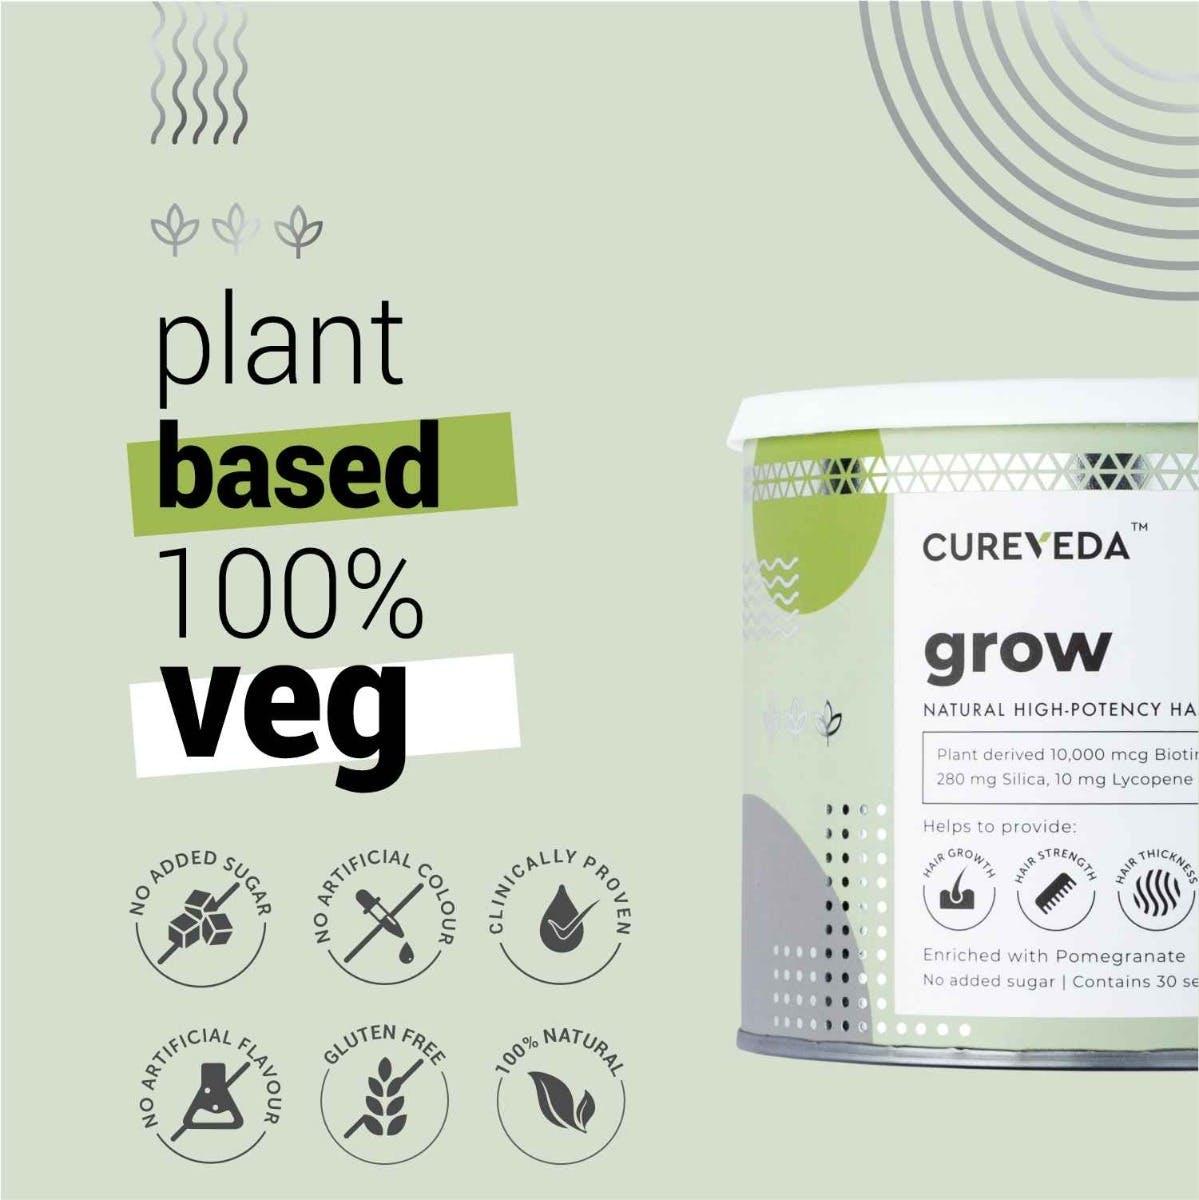 https://curevedaprod.imgix.net/h/t/httpscureveda.comwp-contentuploads202001grow-plant-based-card-_1_1_1.jpg